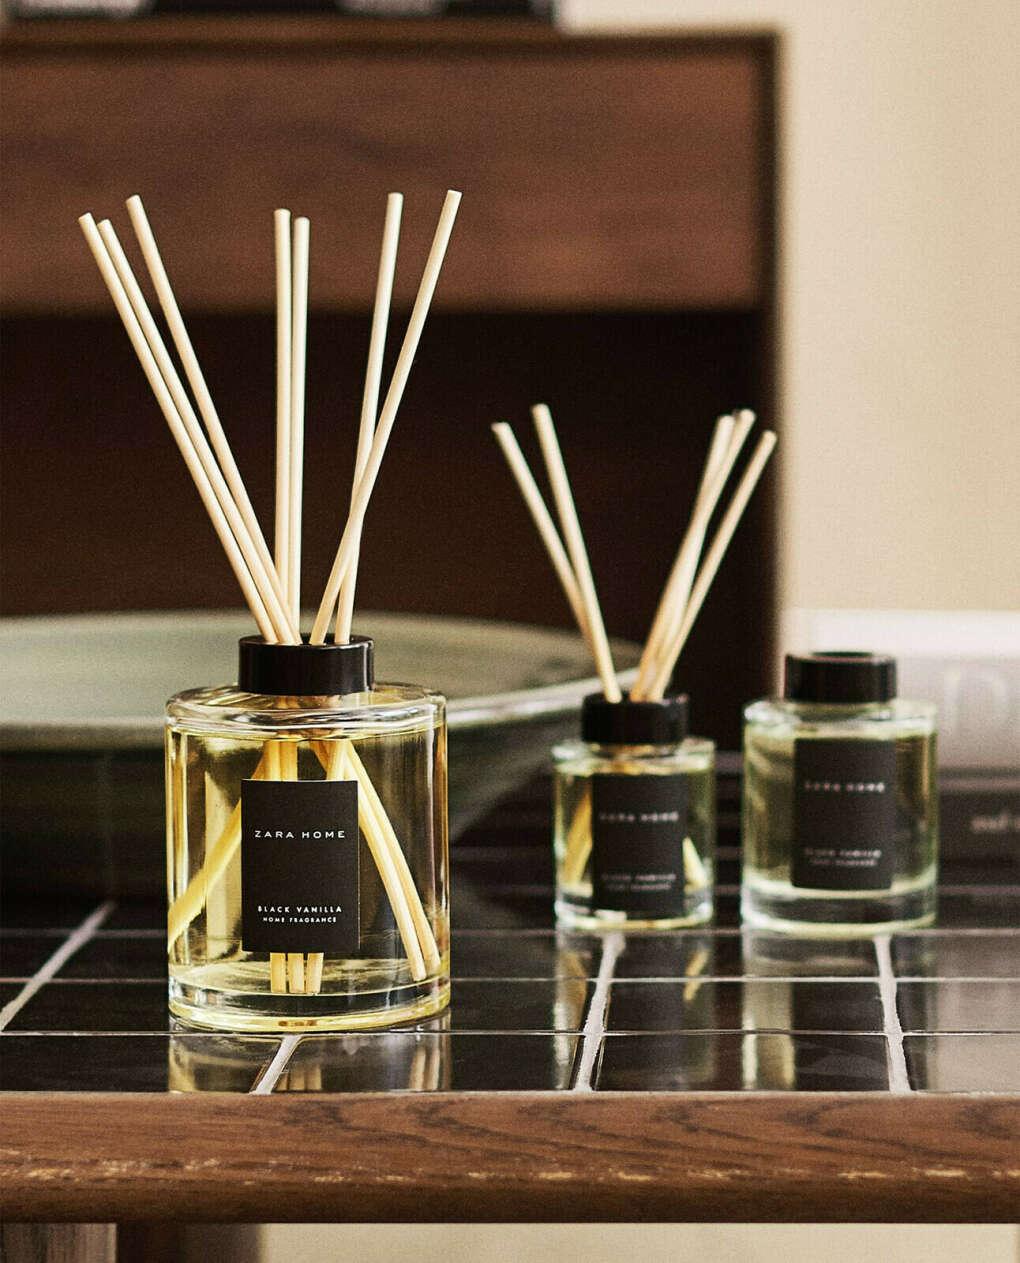 Диффузор с ротанговыми палочками Black Vanilla by Zara Home 500 ml